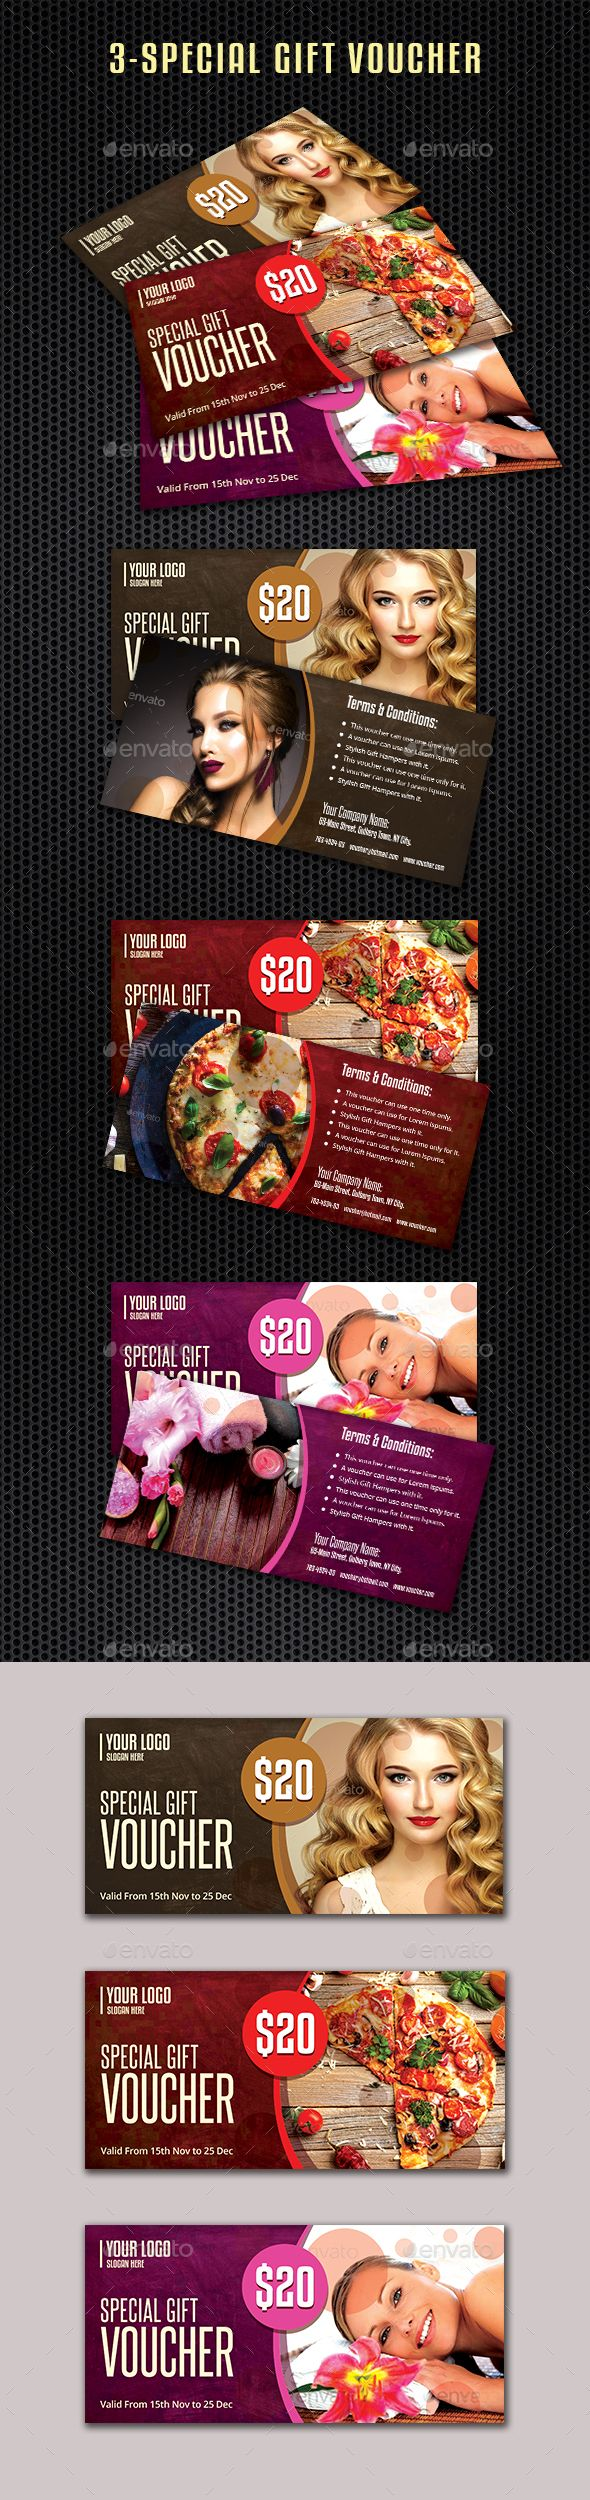 Best 25 gift voucher design ideas on pinterest coupon design gift vouchers template xflitez Images